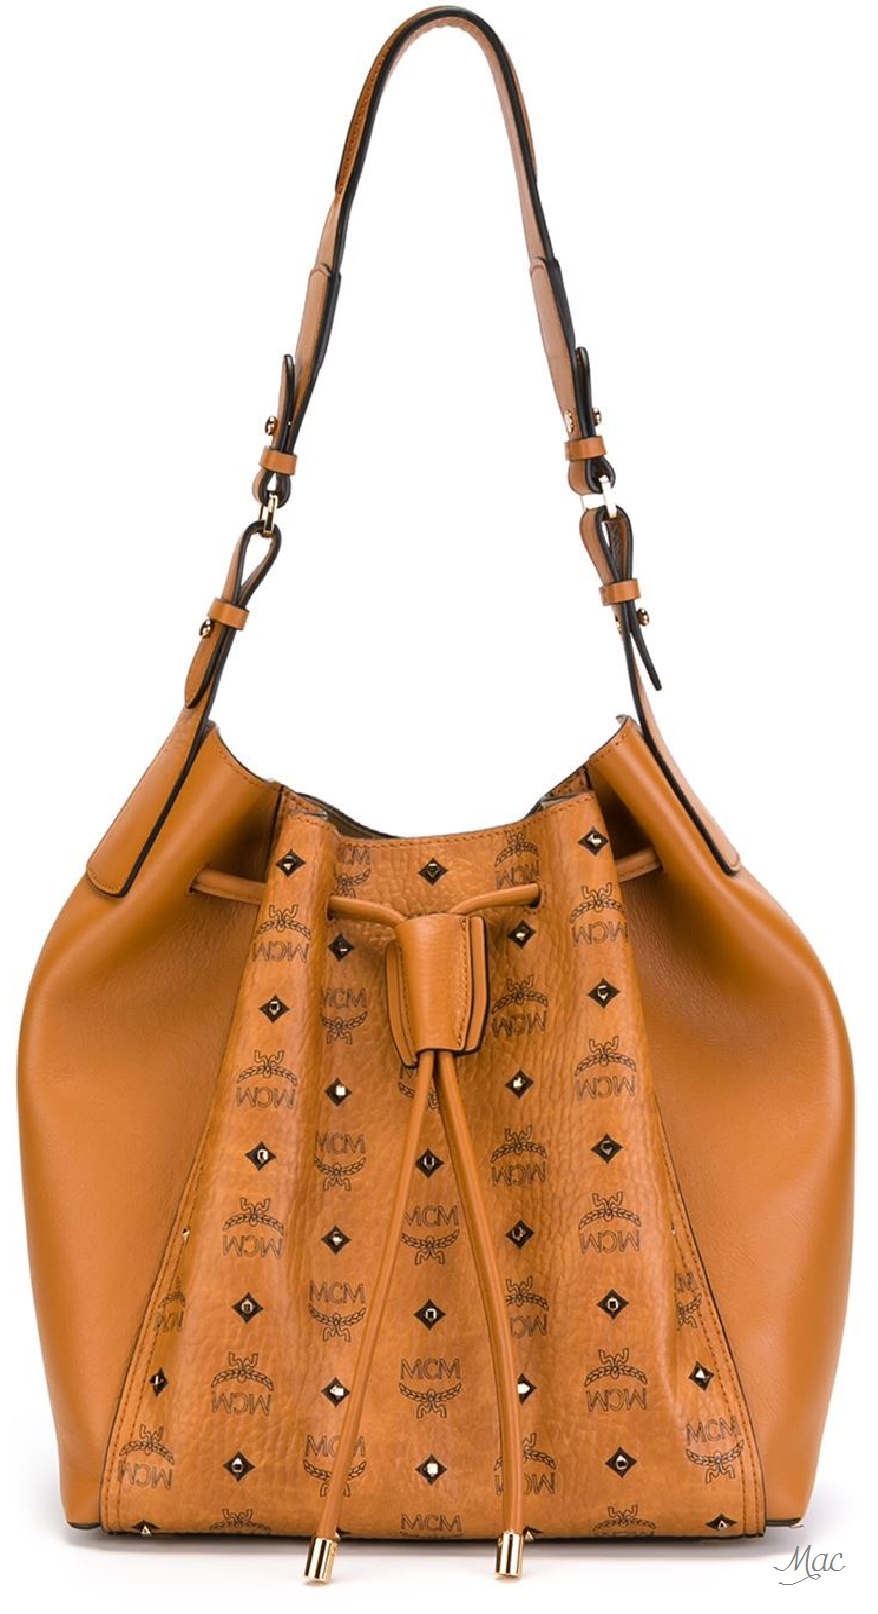 Mcm Gold Visetos Drawstring Bucket Bag Bucket Bag Bags Drawstring Bucket Bag